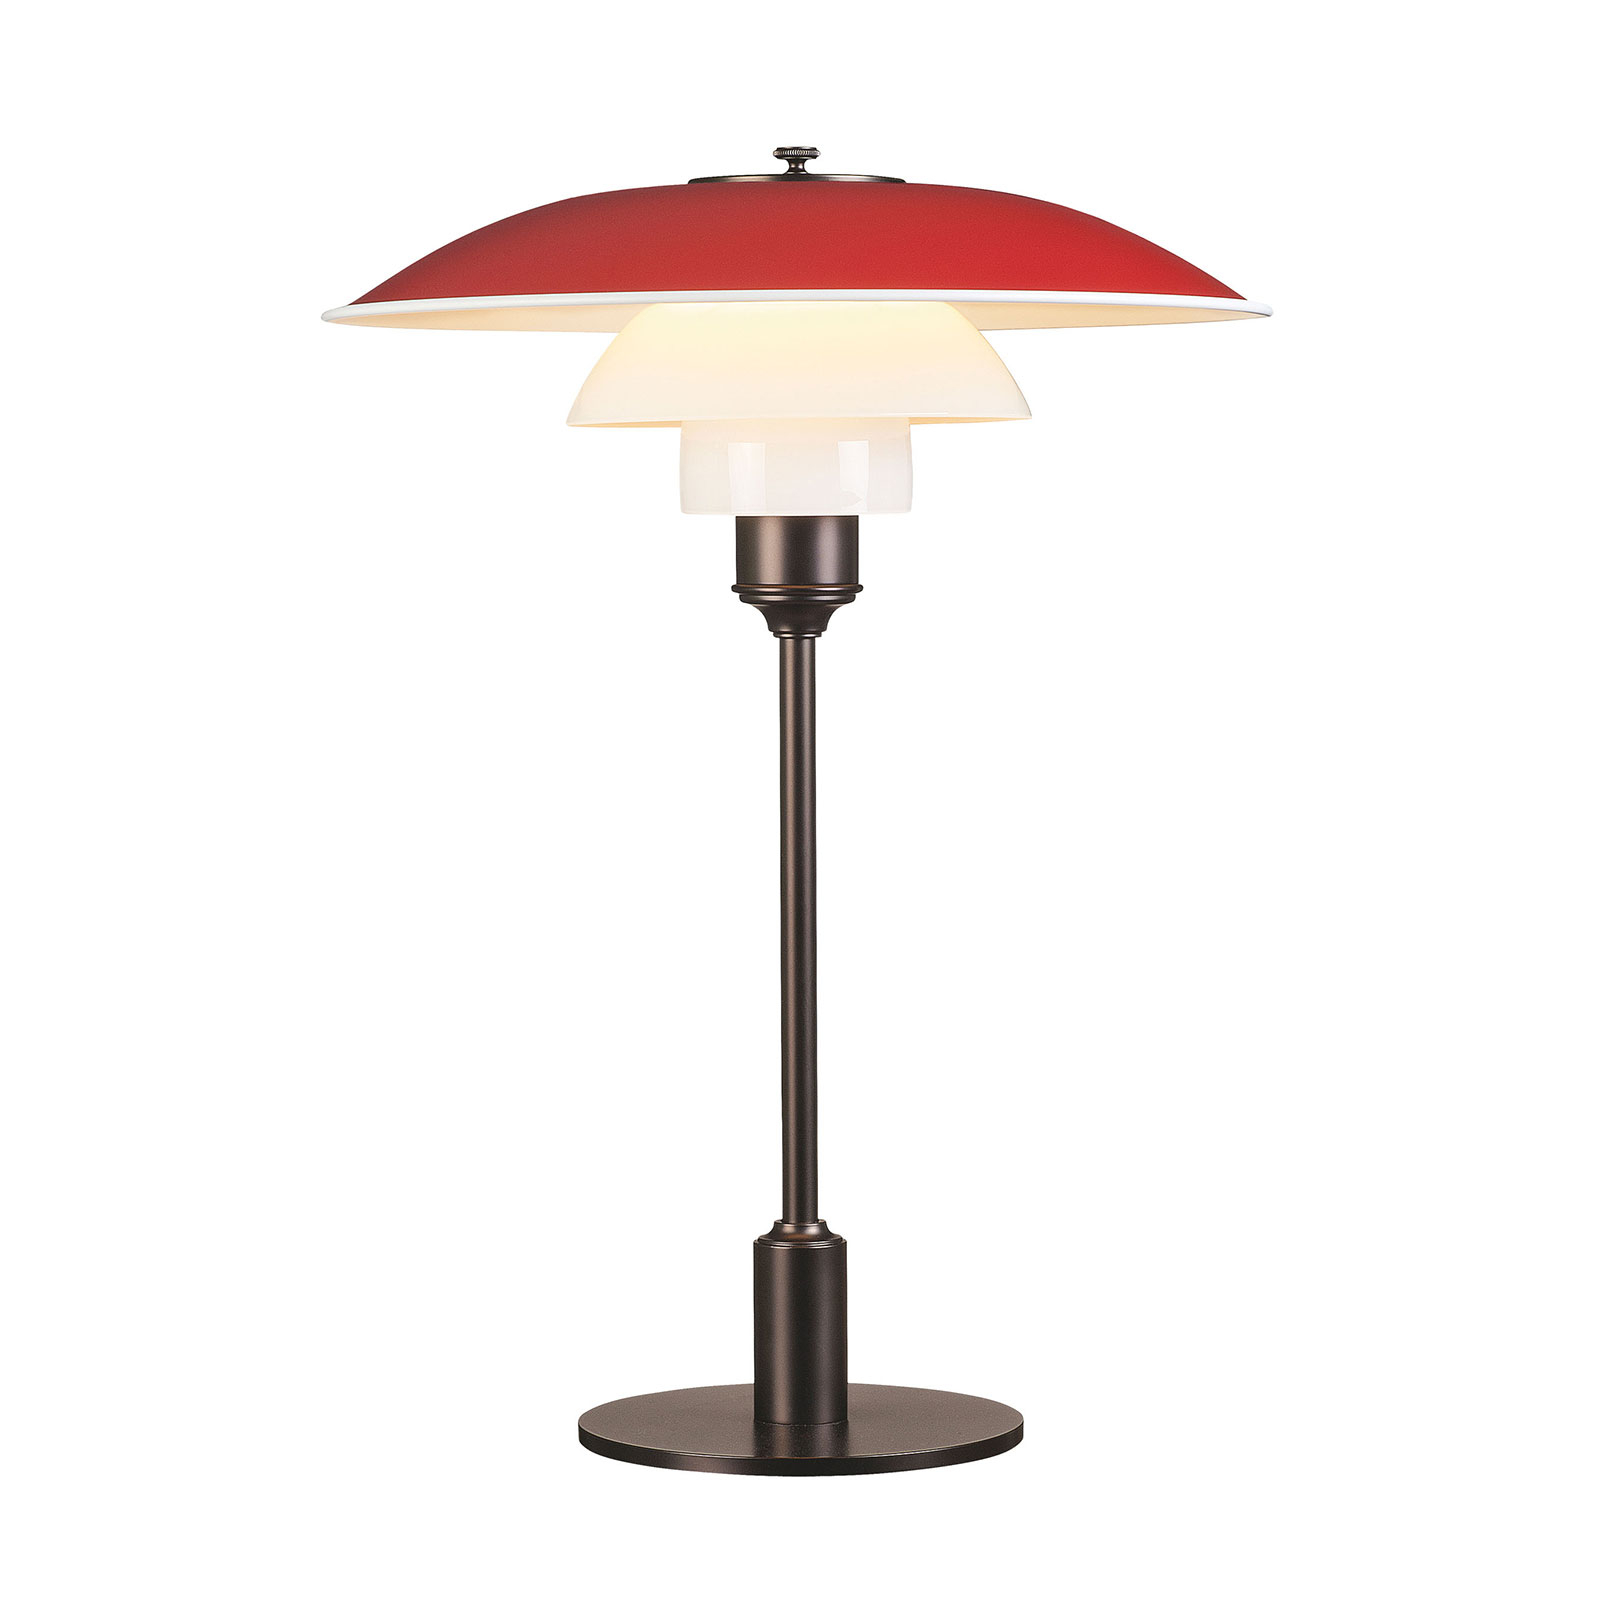 Louis Poulsen PH 3 1/2-2 1/2 tafellamp bruin